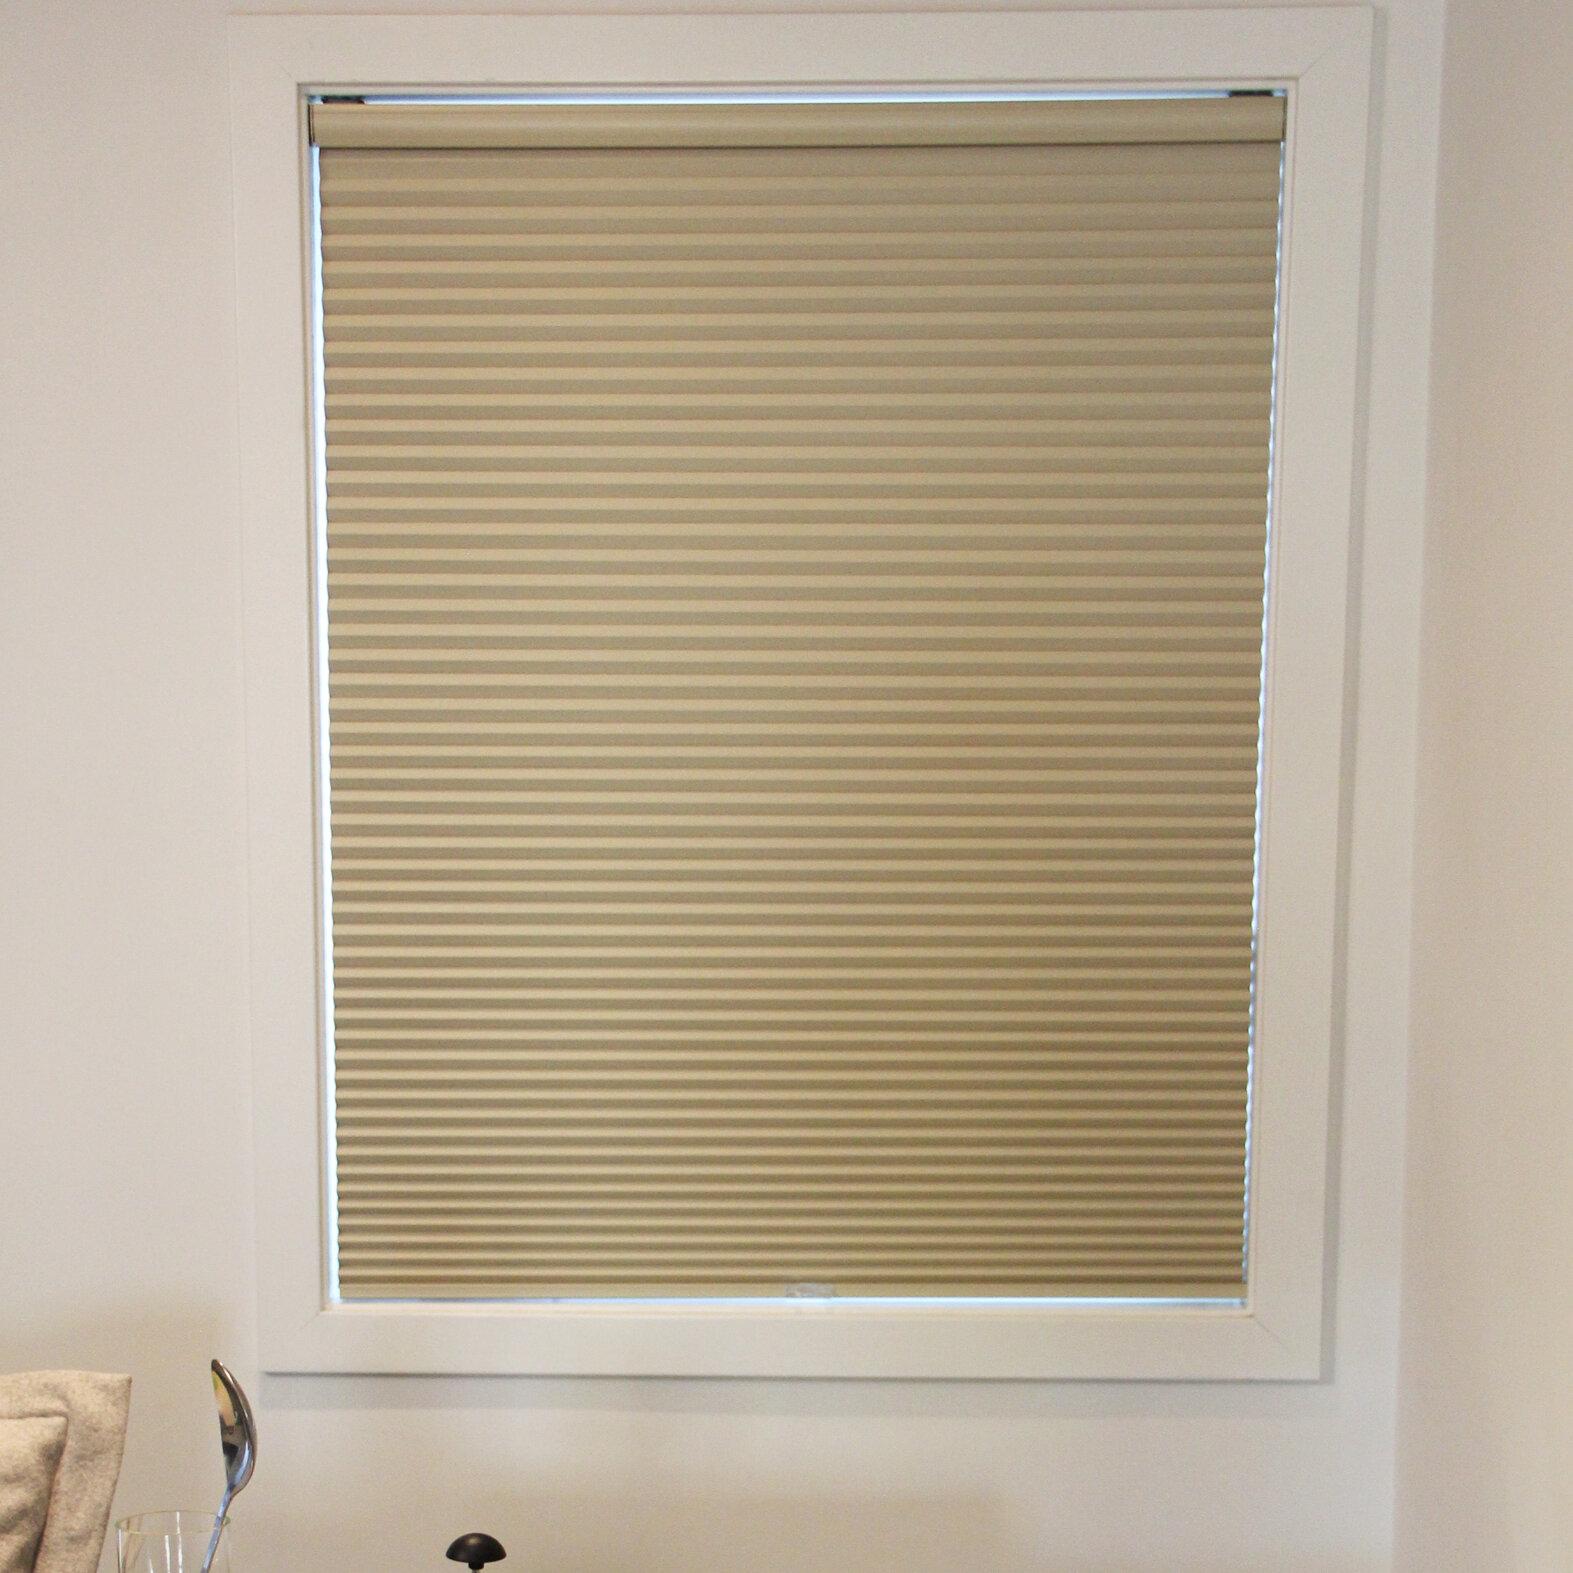 window blinds cordless astley bridge